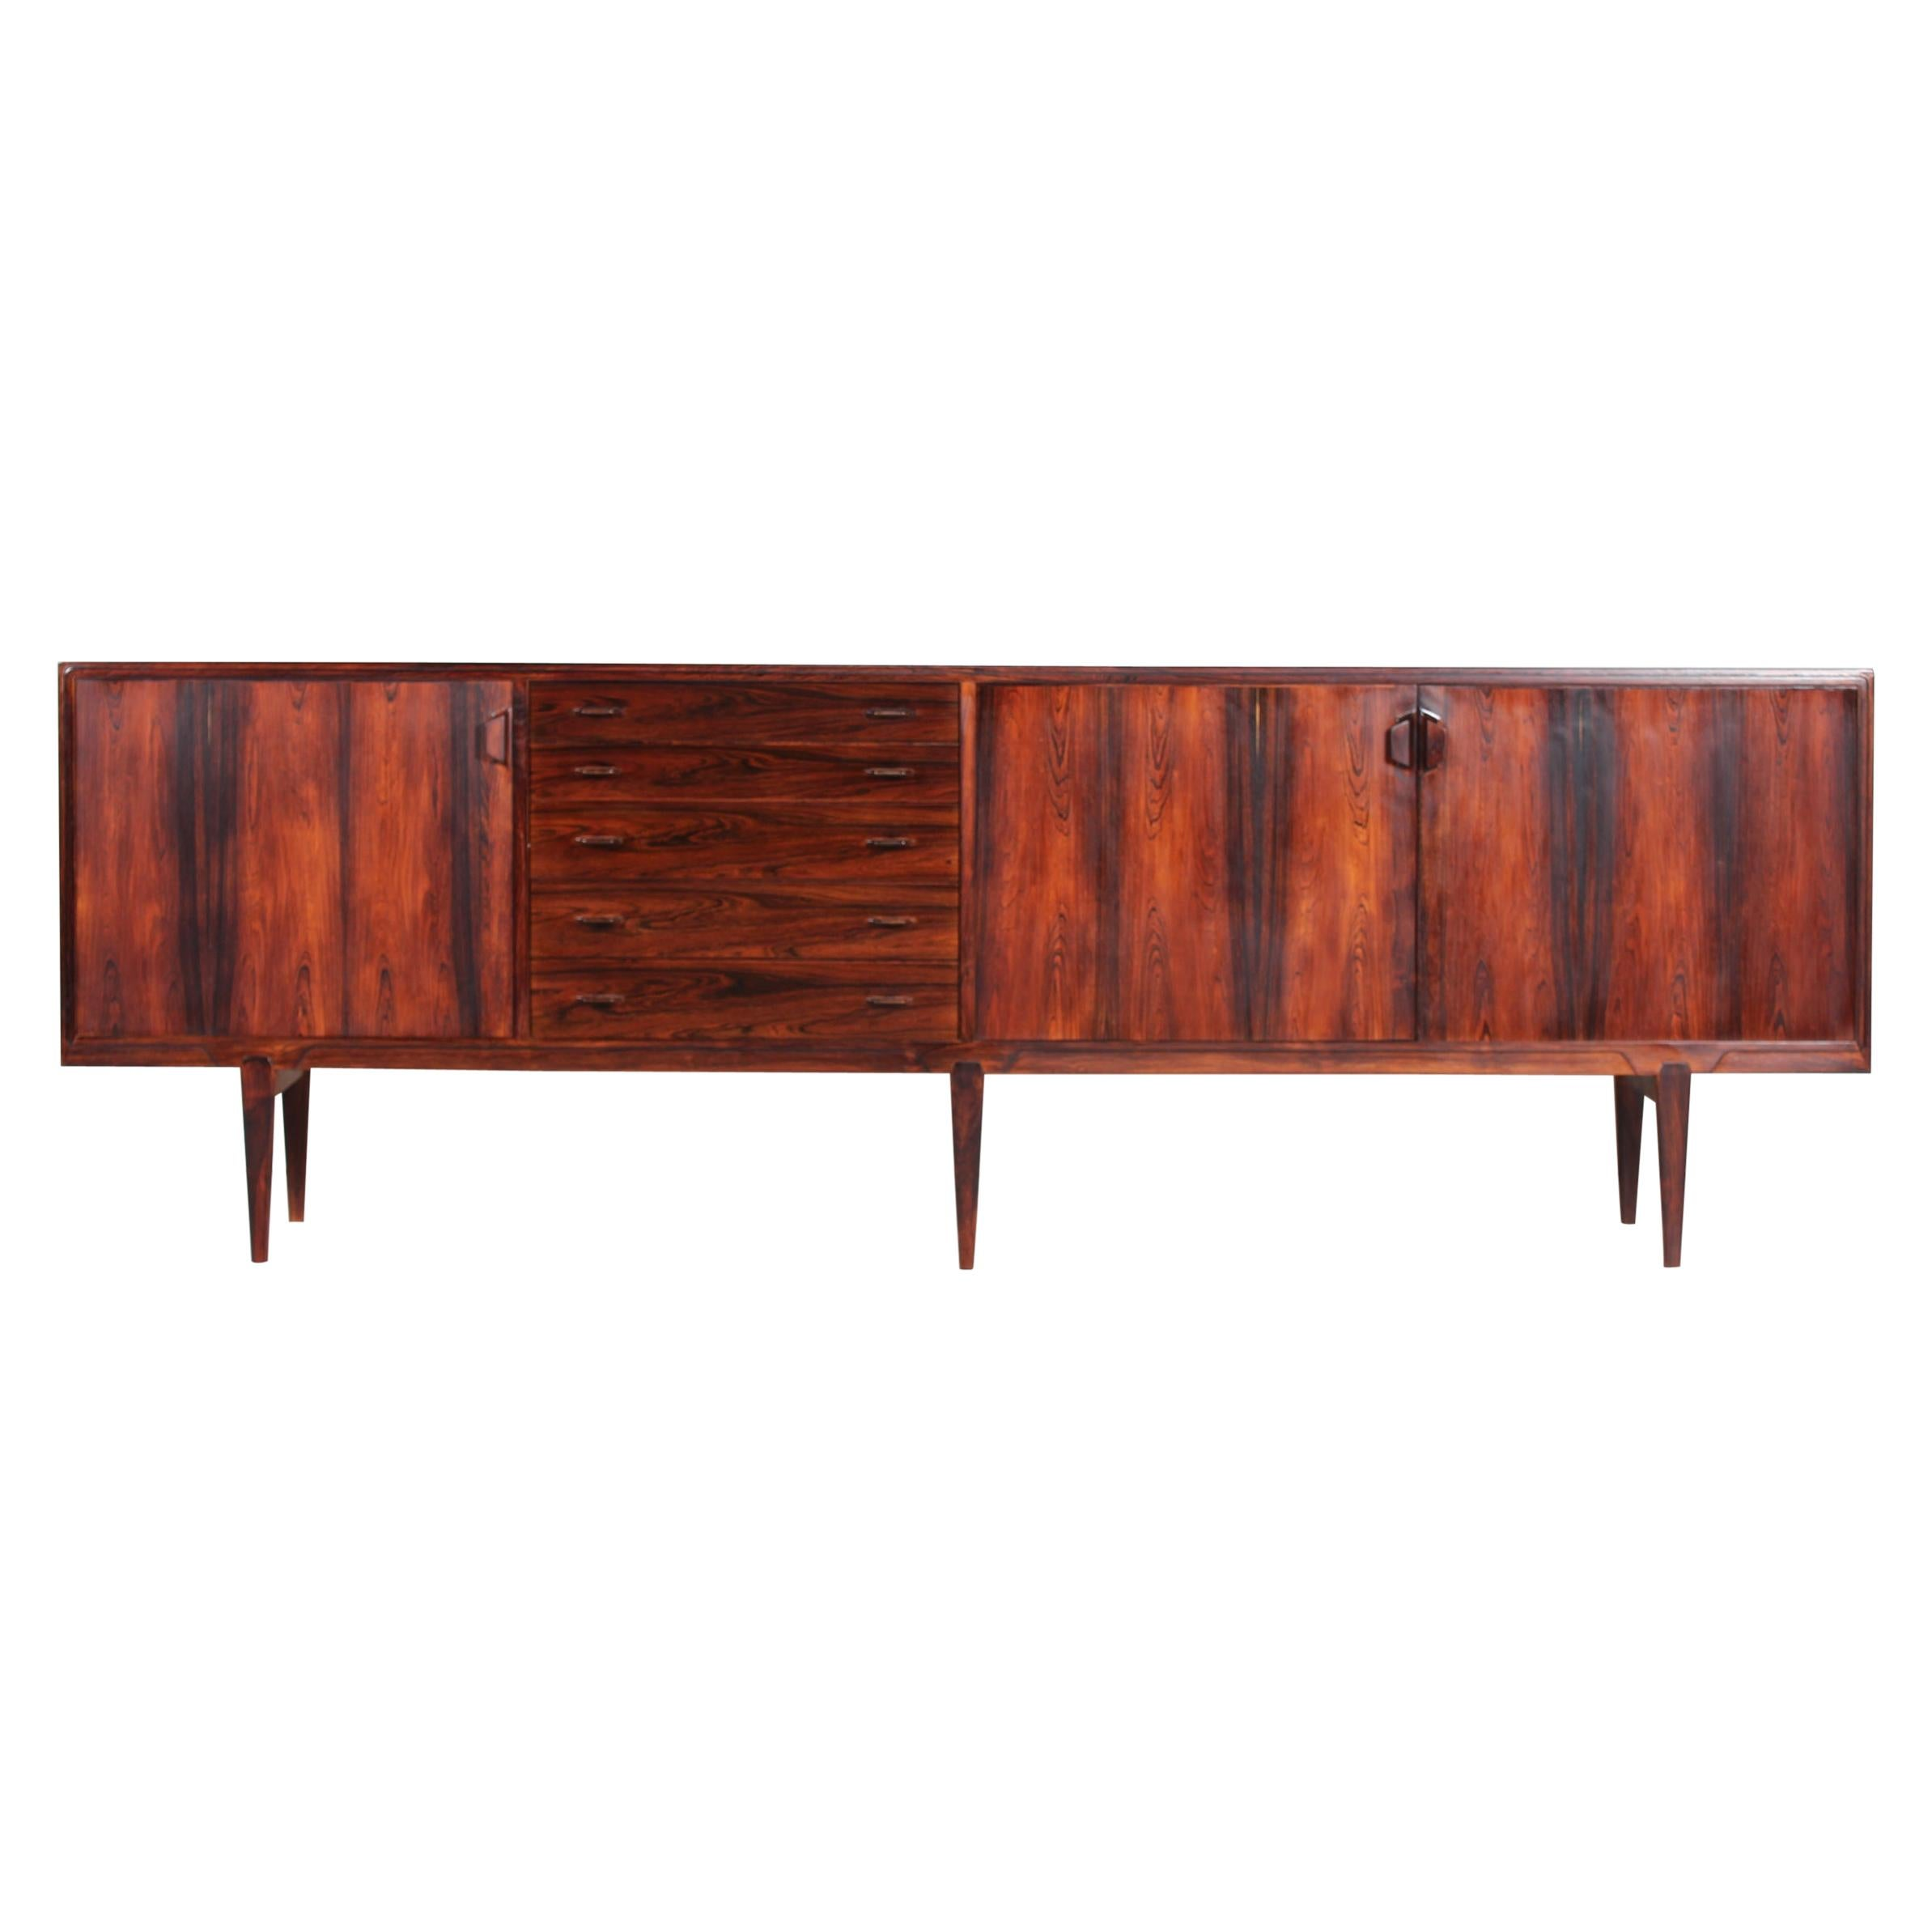 Henry Rosengren Hansen Sideboard of Rosewood by Brande Møbelfabrik, Denmark